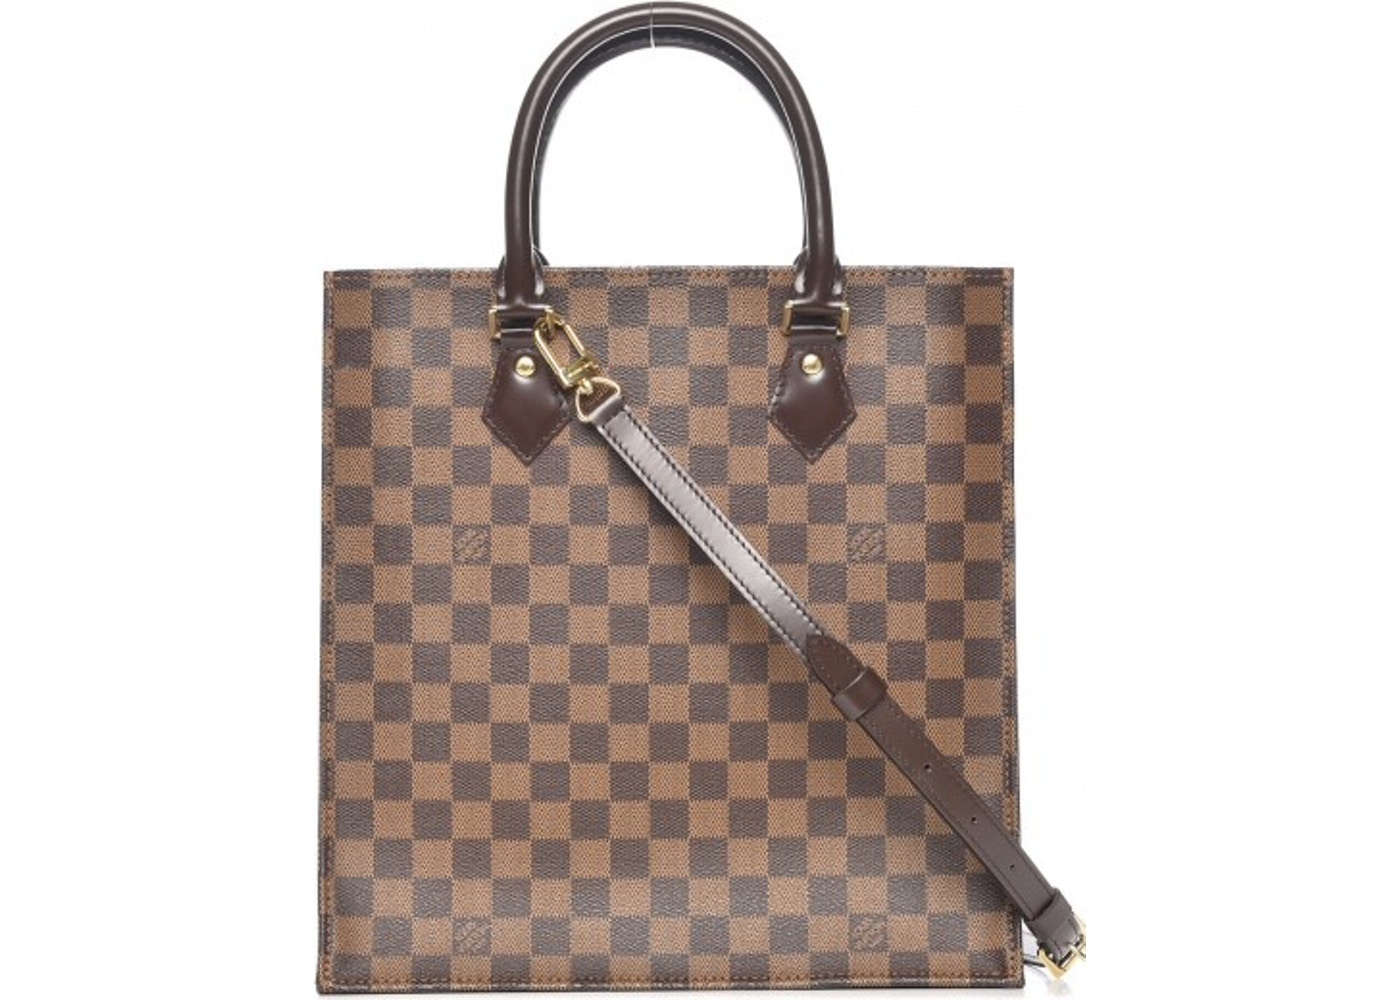 Louis Vuitton Sac Plat Nm Damier Ebene Brown. Damier Ebene Brown fa1a60ac17e